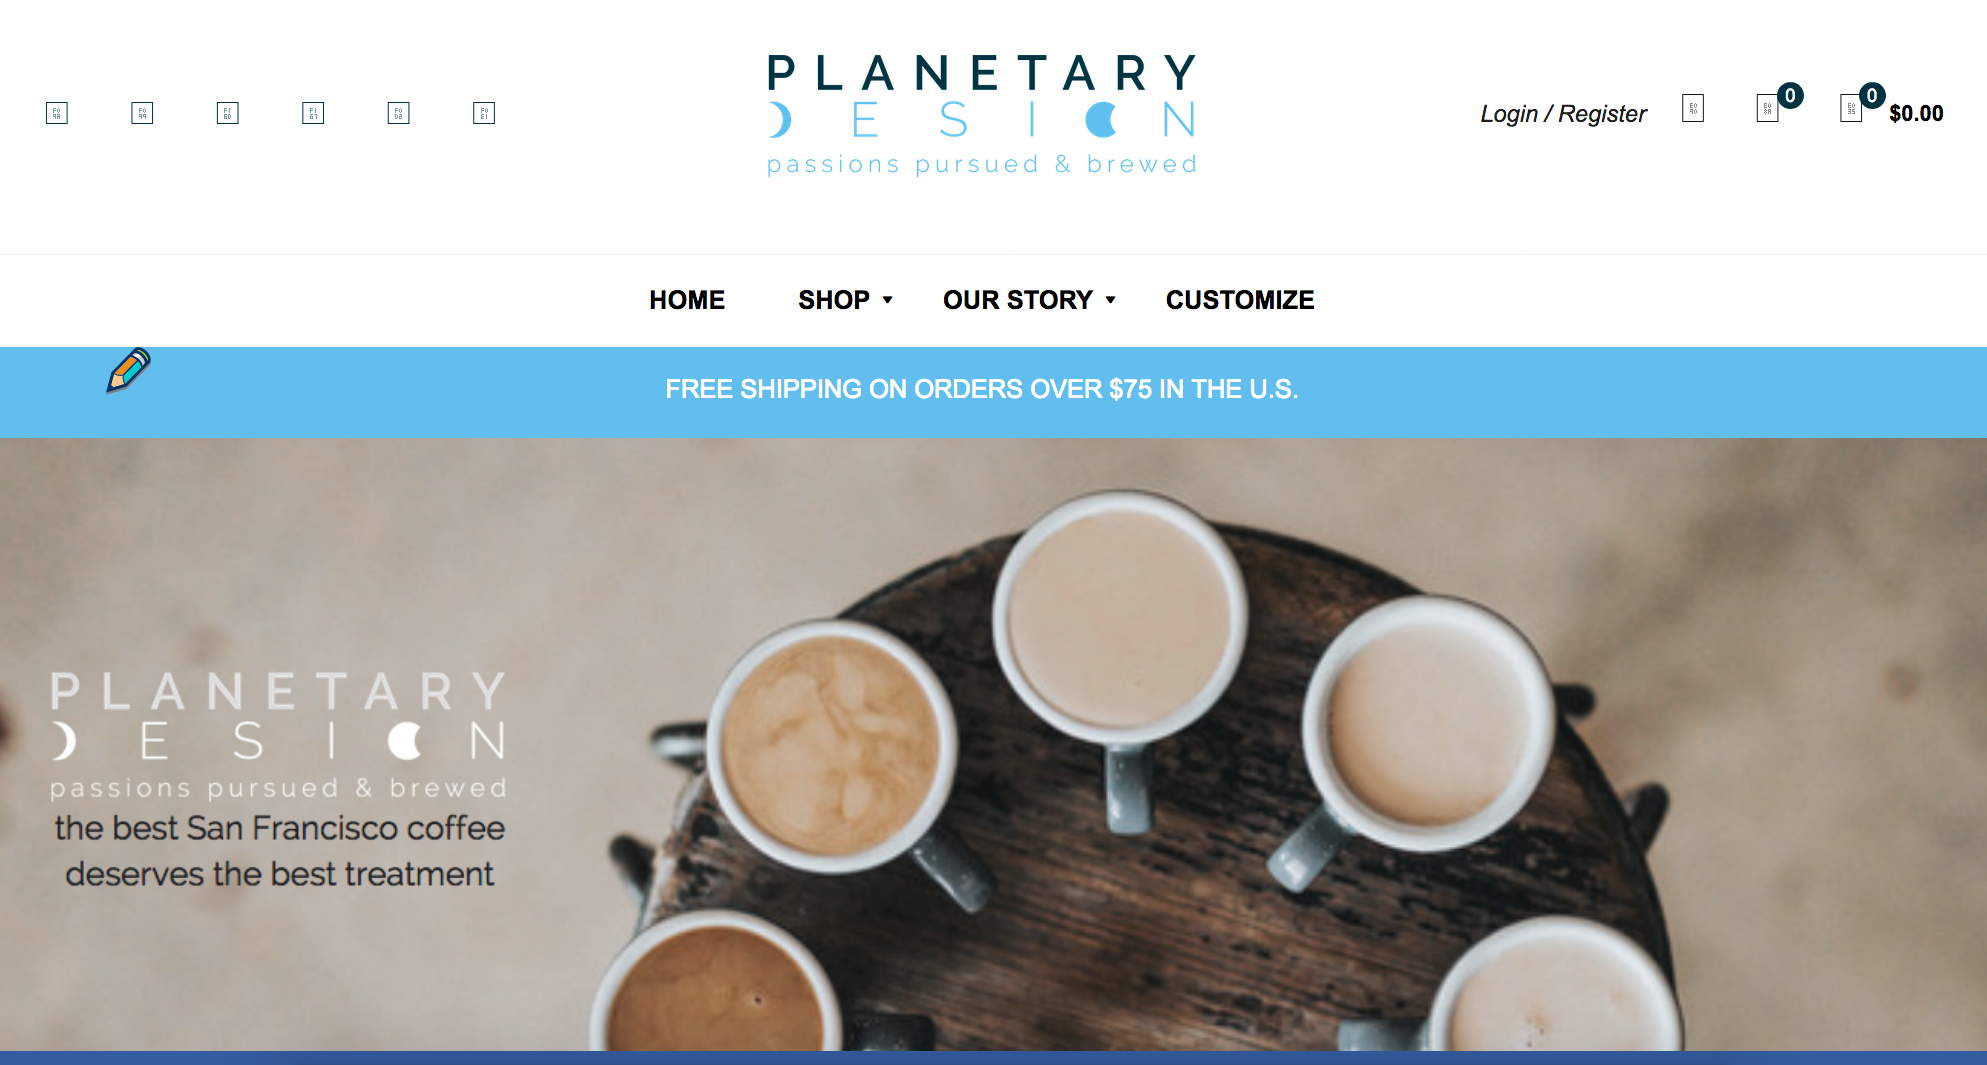 Planetary Design Campaign